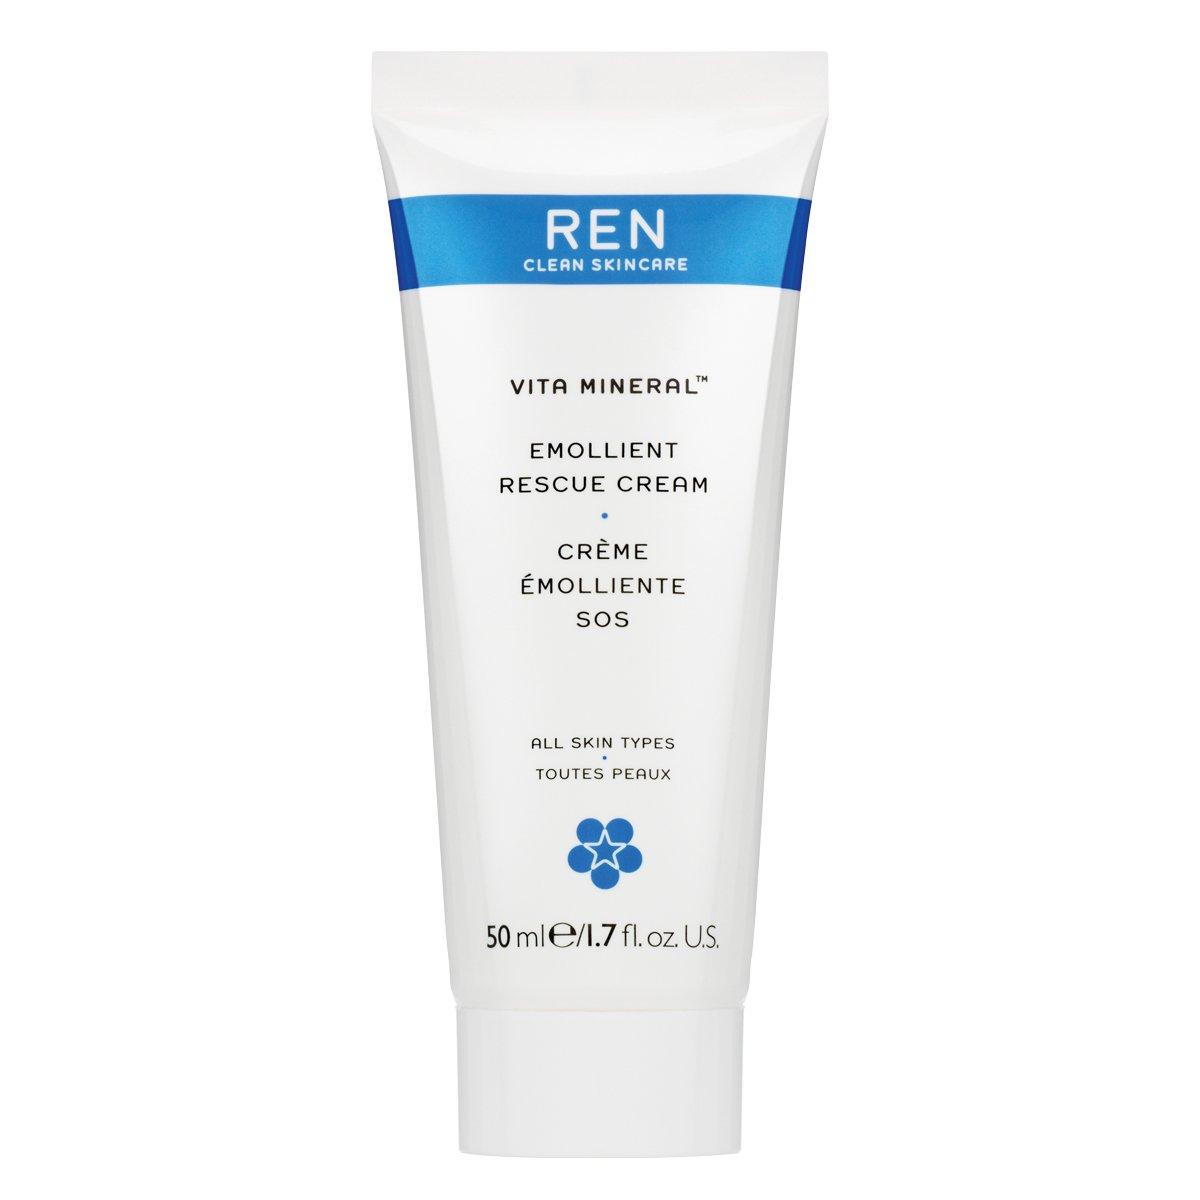 REN Vita Mineral Emollient Rescue Cream, 1.7 Ounce